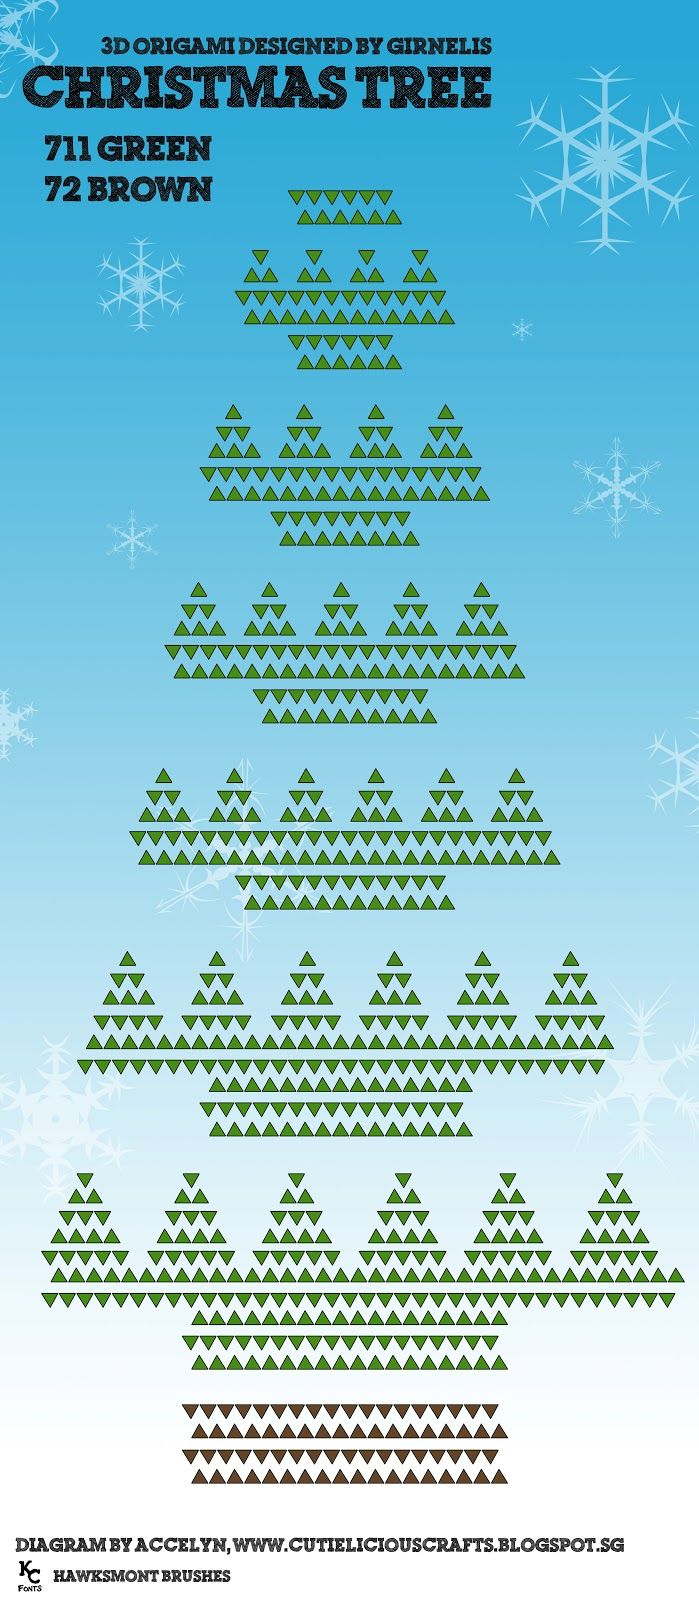 3d Origami Christmas Tree Diagram Automotive Wiring Pigorigami Pig Instructionsorigami Diagram3d Crea Pinterest And Rh Com Step By